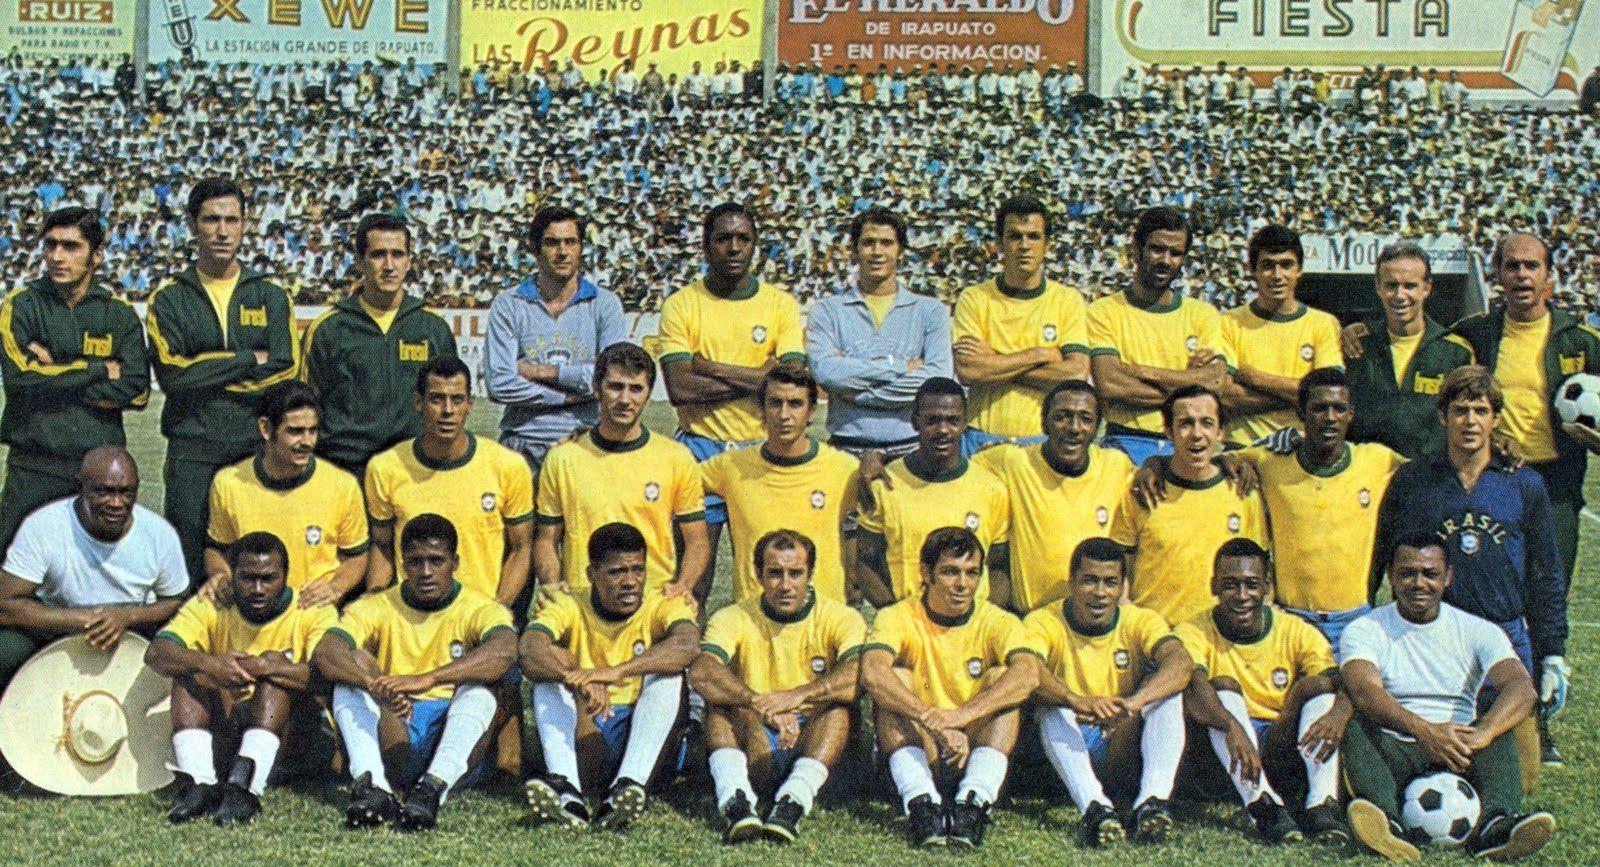 Pin De Futboleemos Em Fútbol Vintage Retro Seleção Brasileira Seleção Brasileira De Futebol Futebol Brasileiro